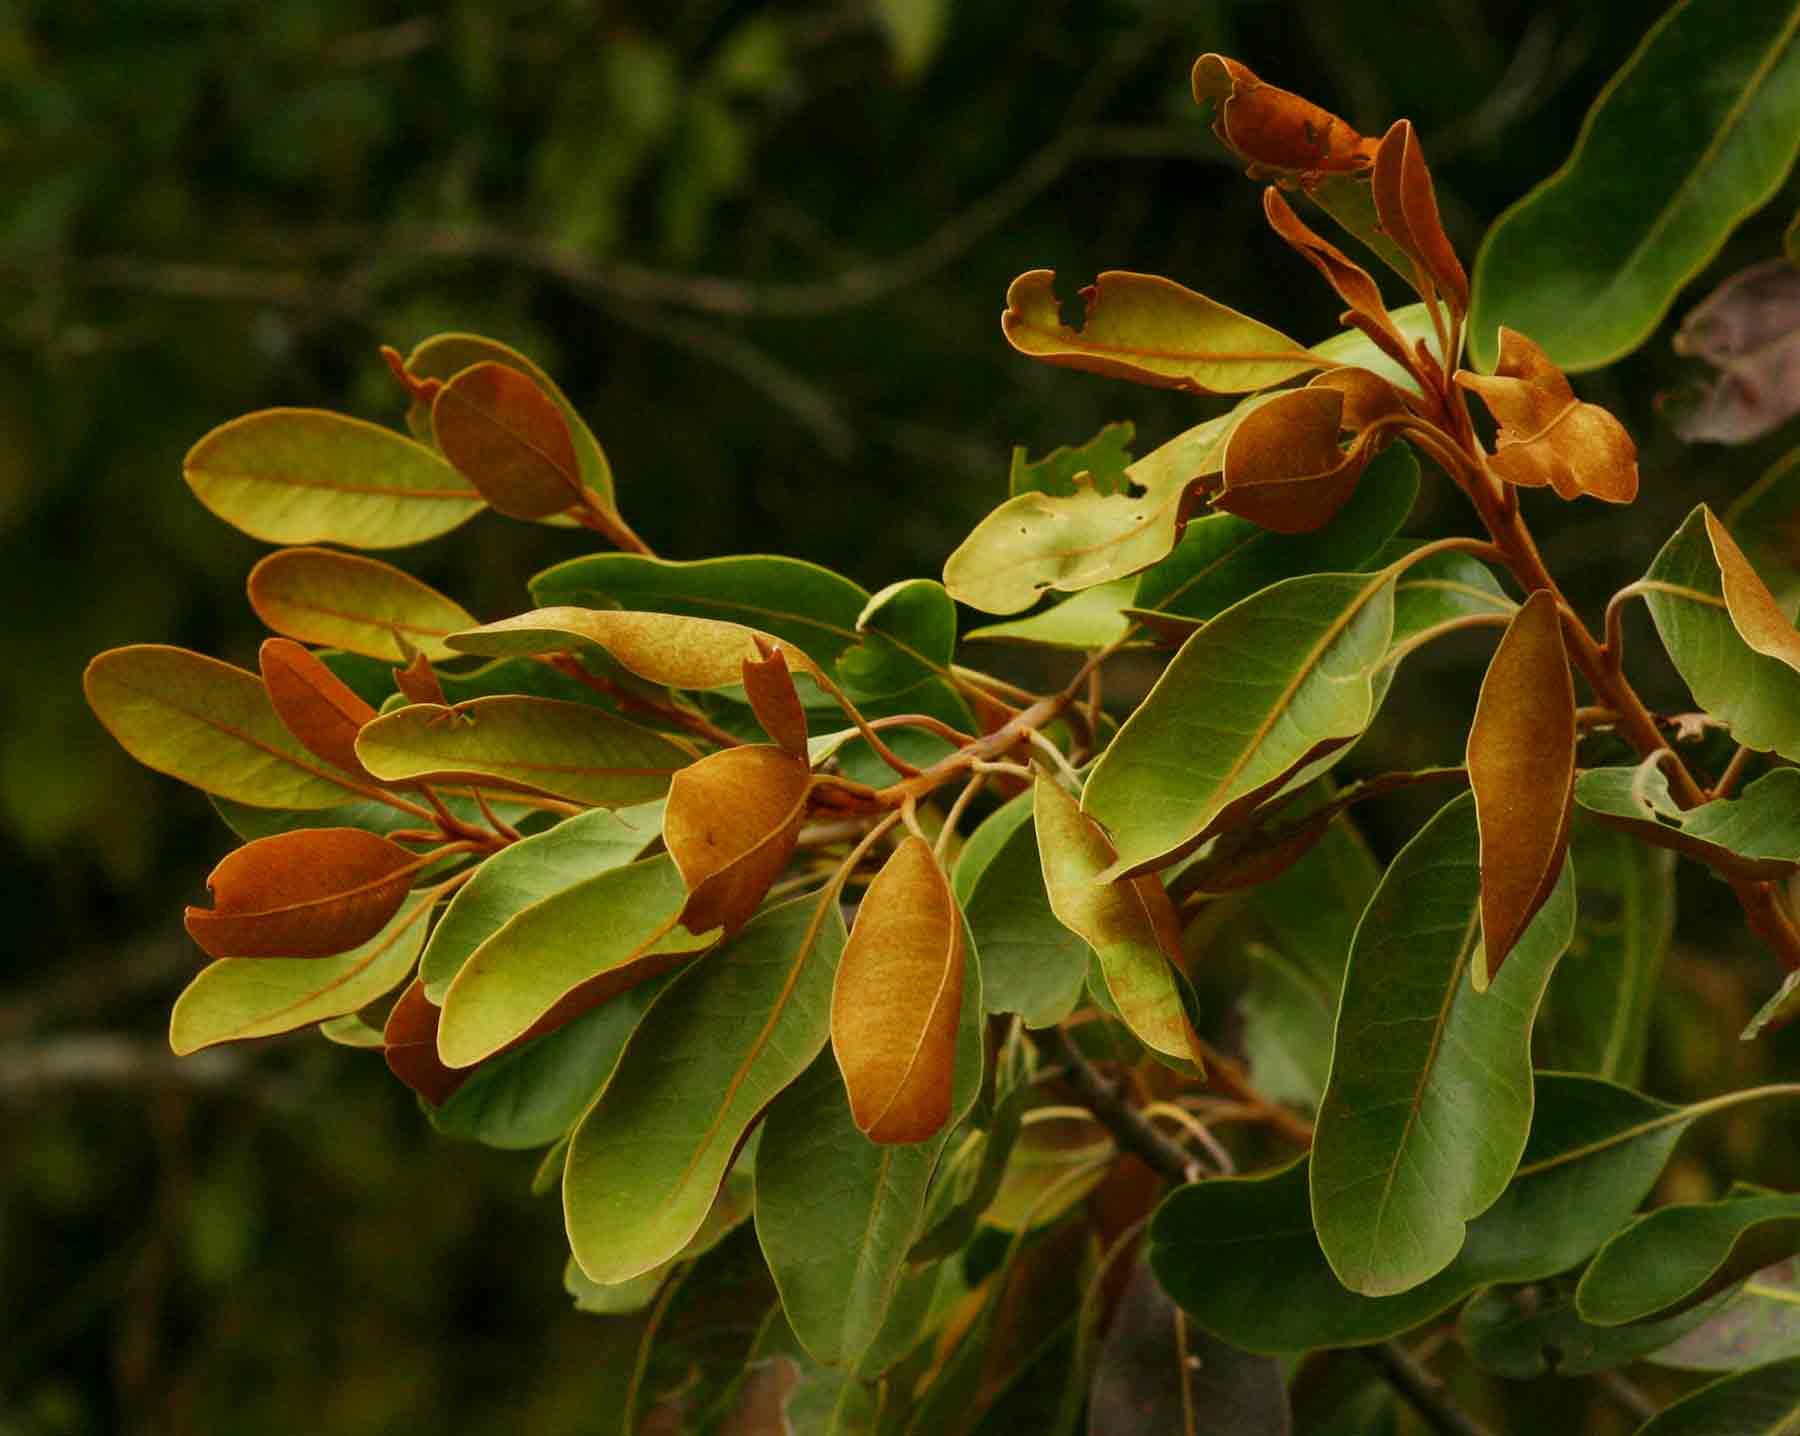 Sideroxylon inerme subsp. diospyroides